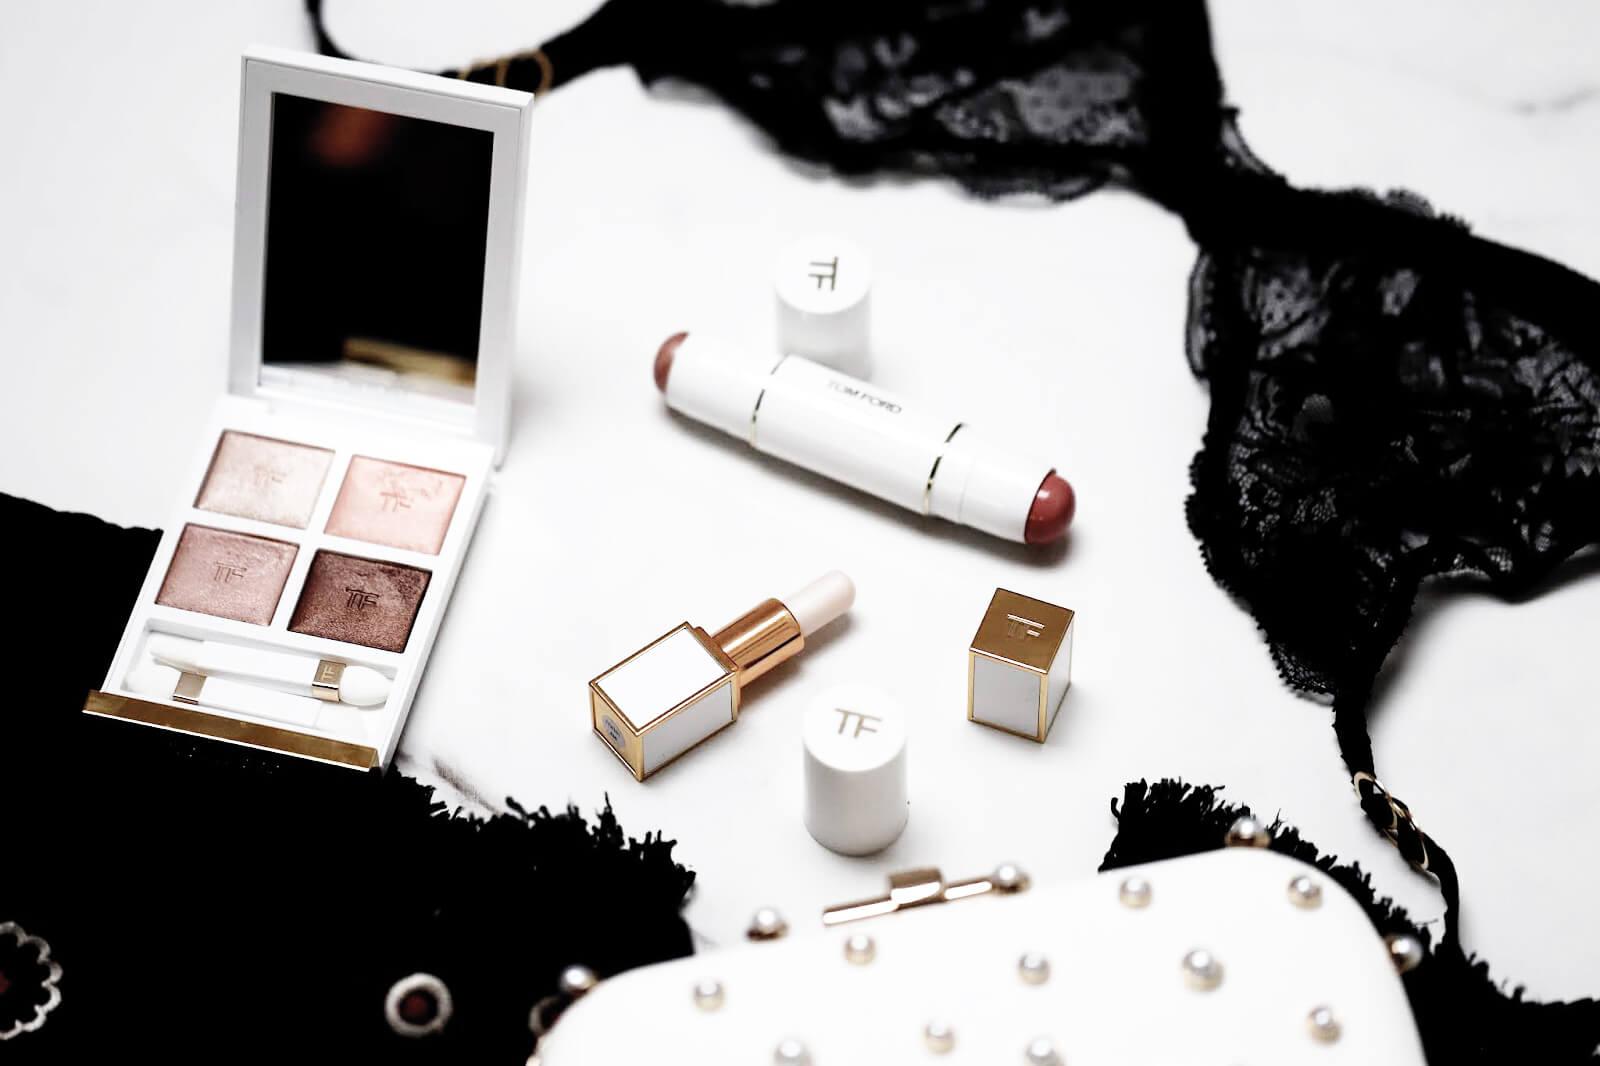 Tom Ford Maquillage Soleil Neige Avis